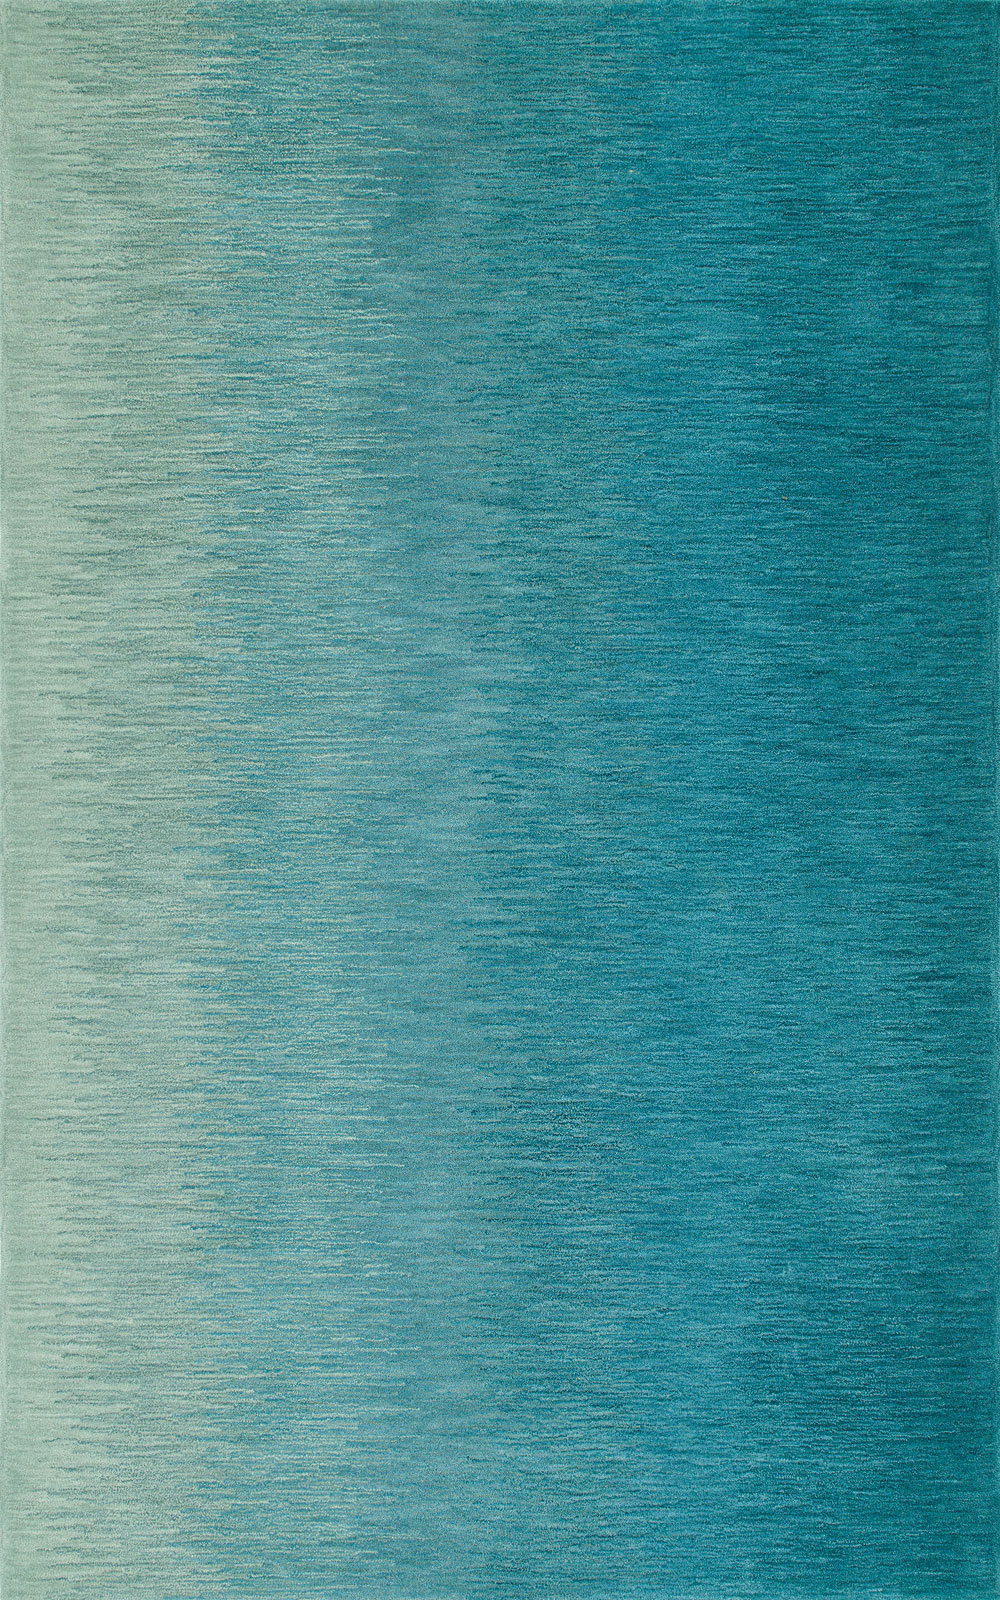 Dalyn Delmar DM4 Aqua Rug